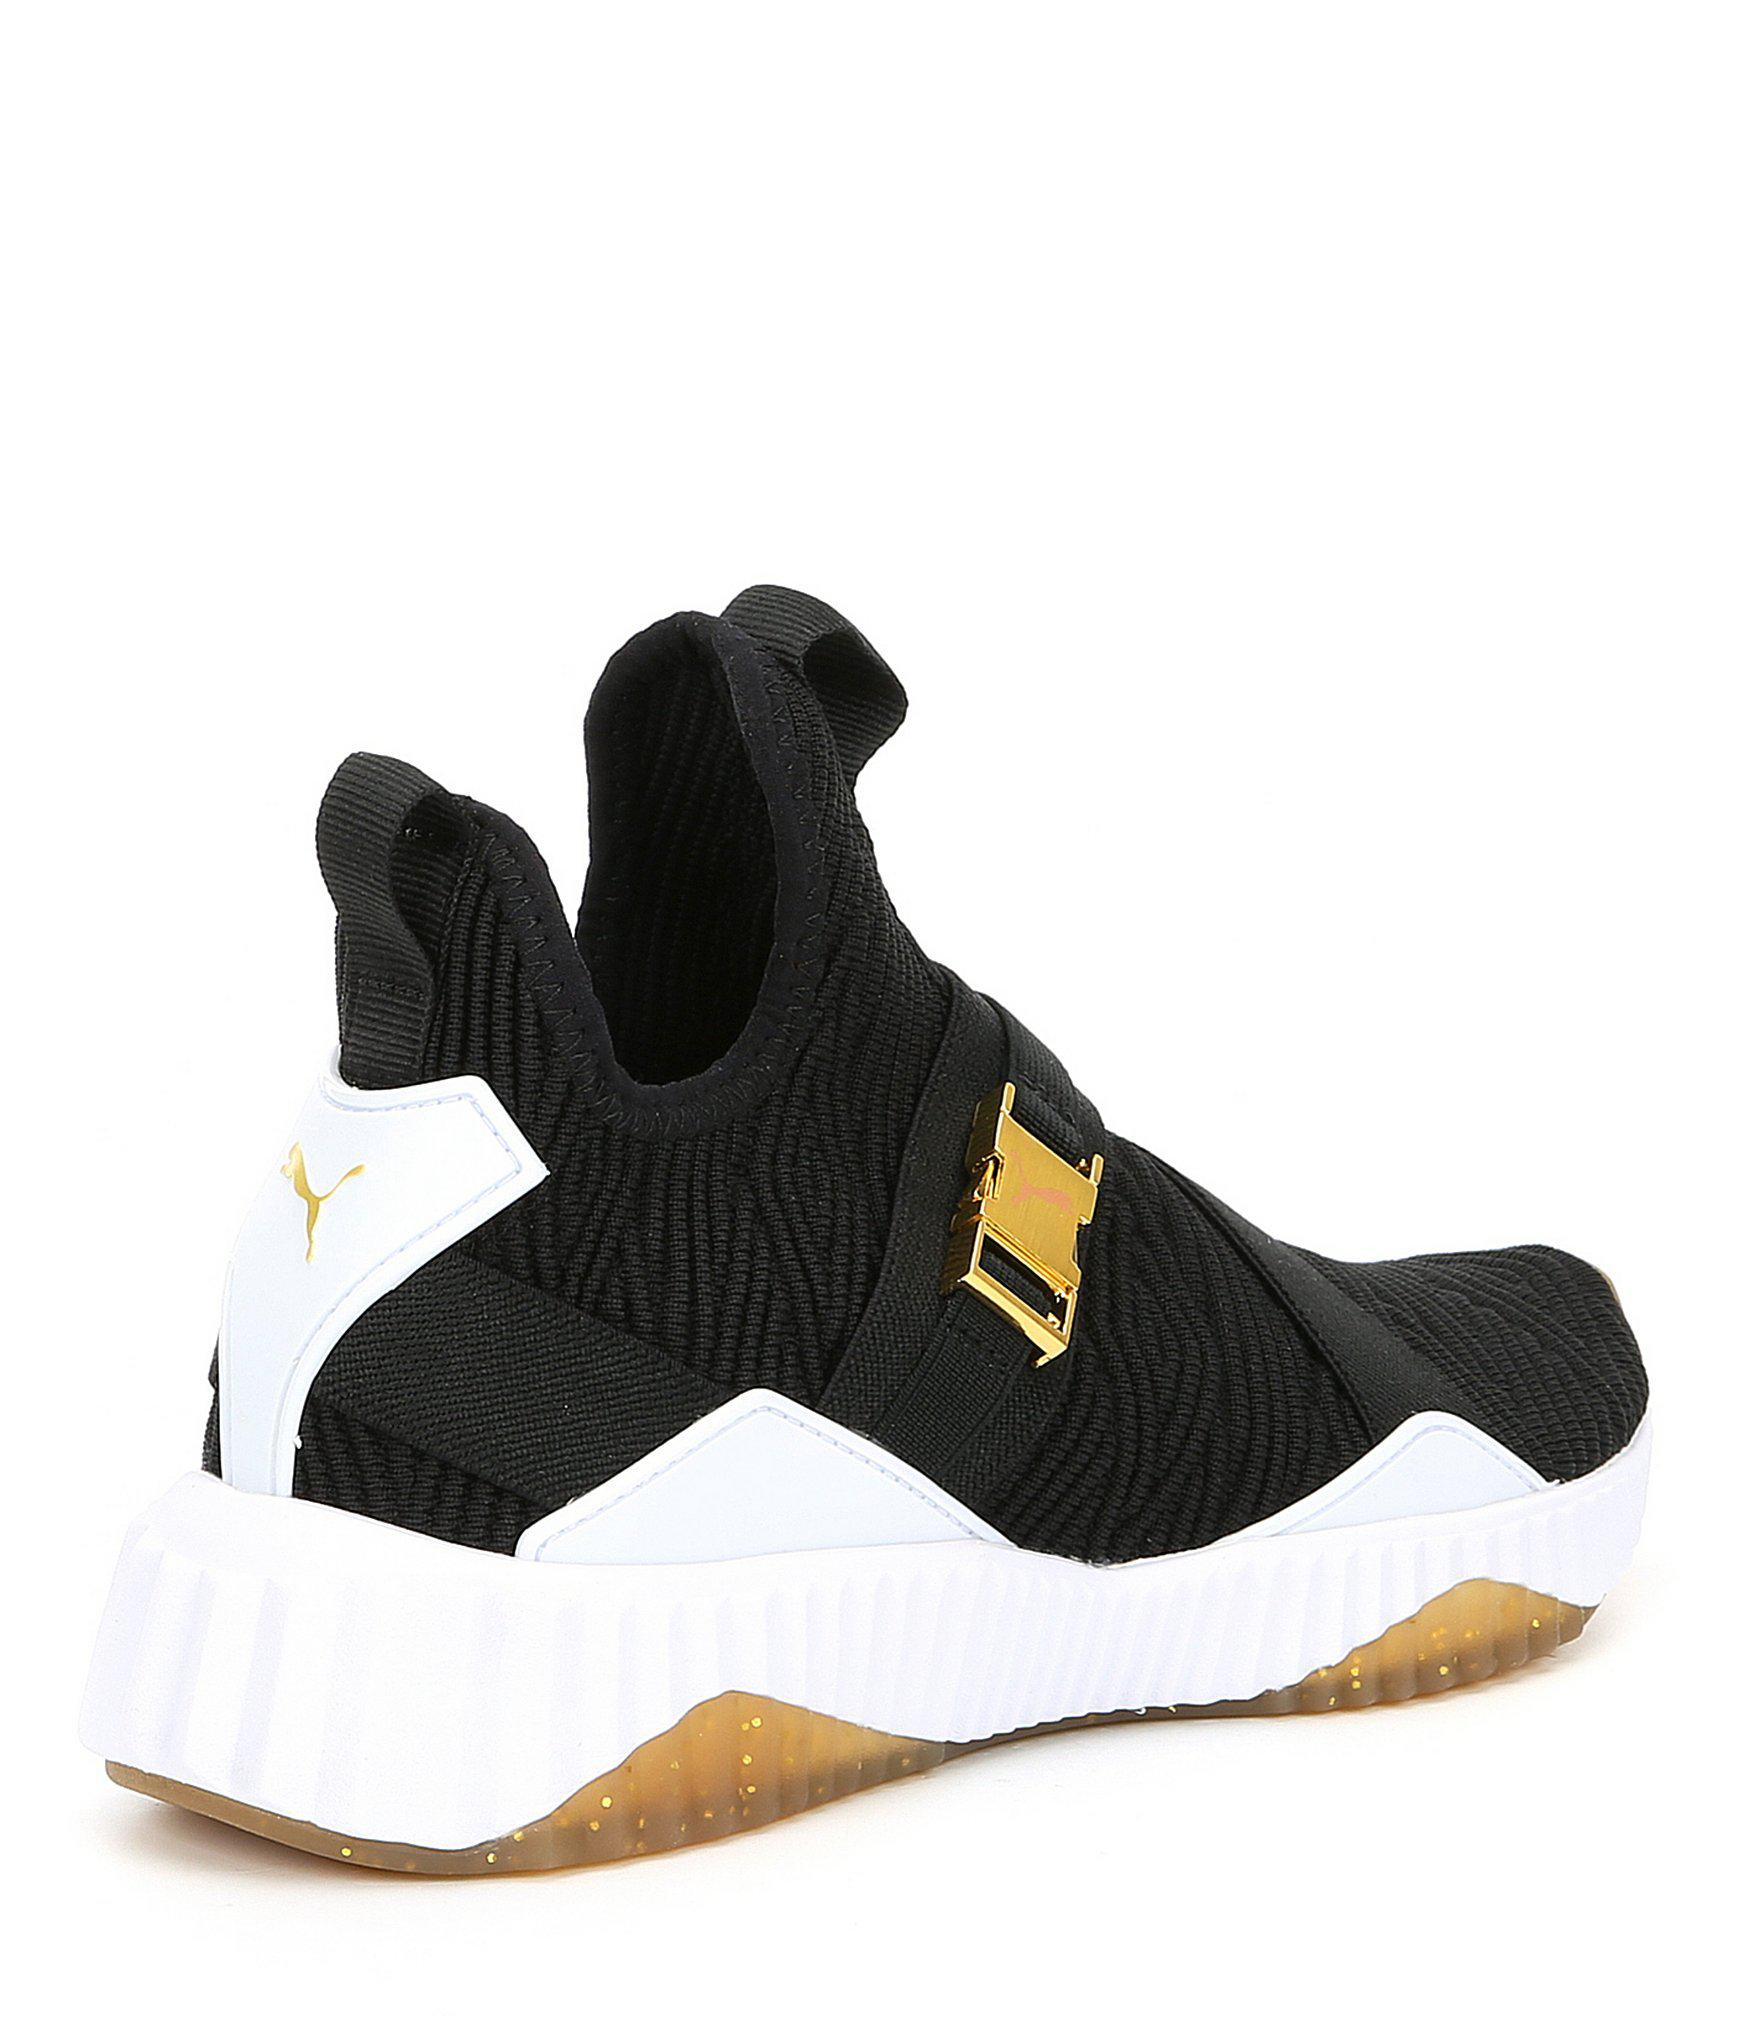 e6504ffd76b1 PUMA - Black Women s Defy Mid Varsity Sneakers - Lyst. View fullscreen